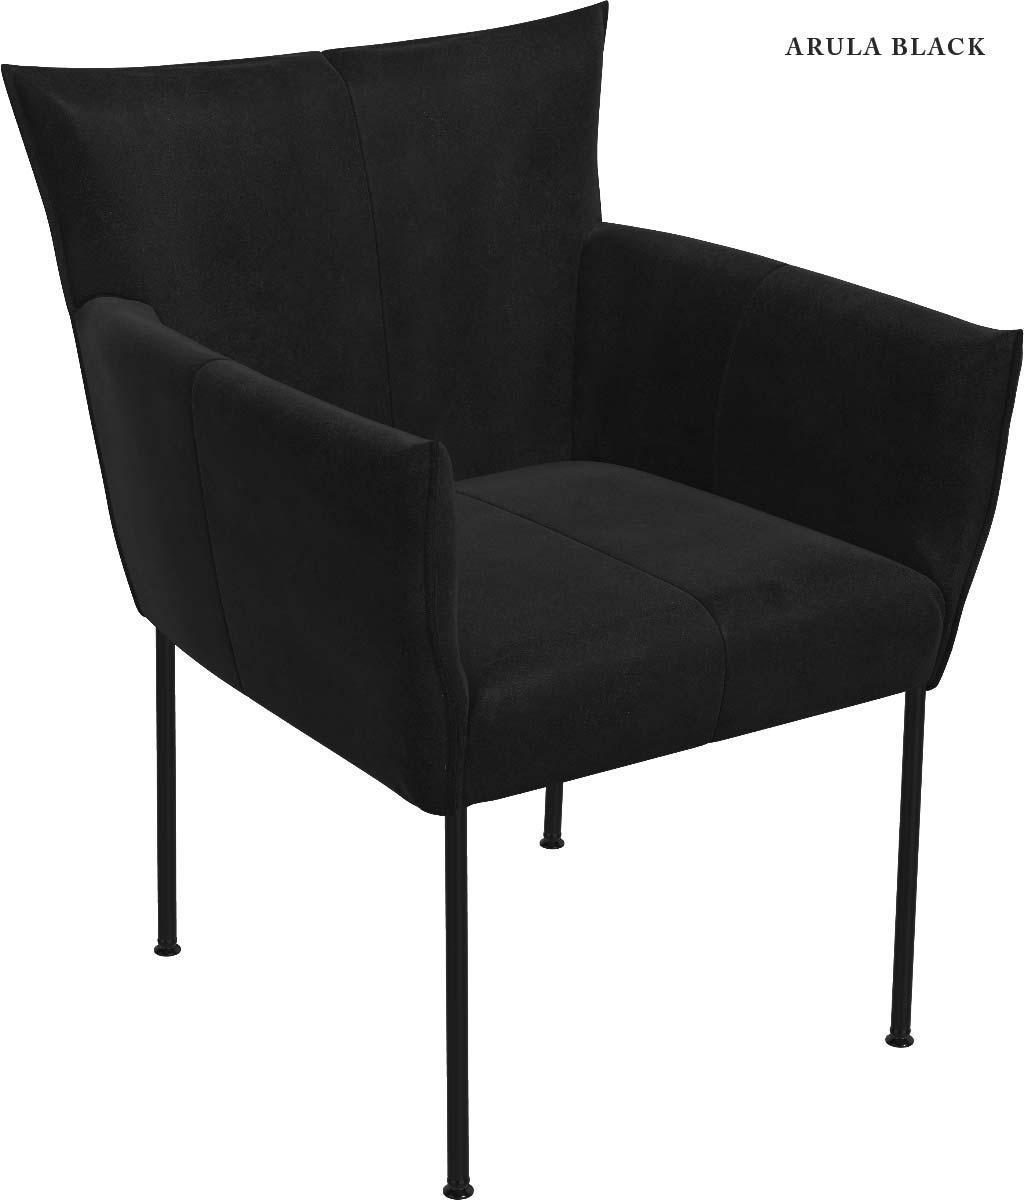 jess-design-stuhl-forward-forza-arula-black-lichtraum24